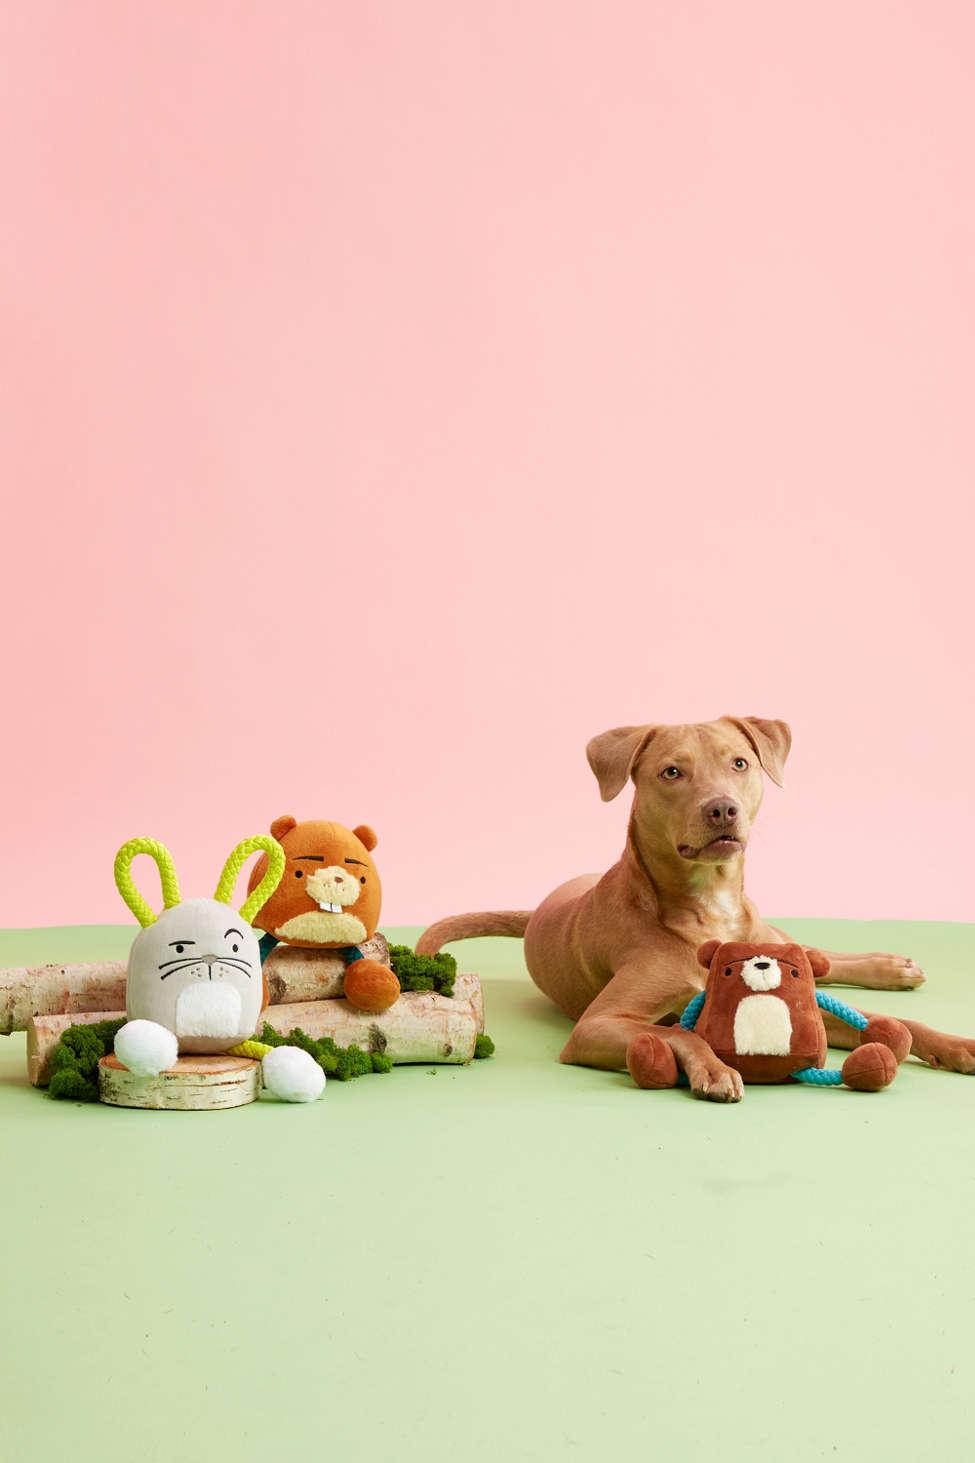 Slide View: 2: BARK Woodland Tugimals Dog Toy Bundle